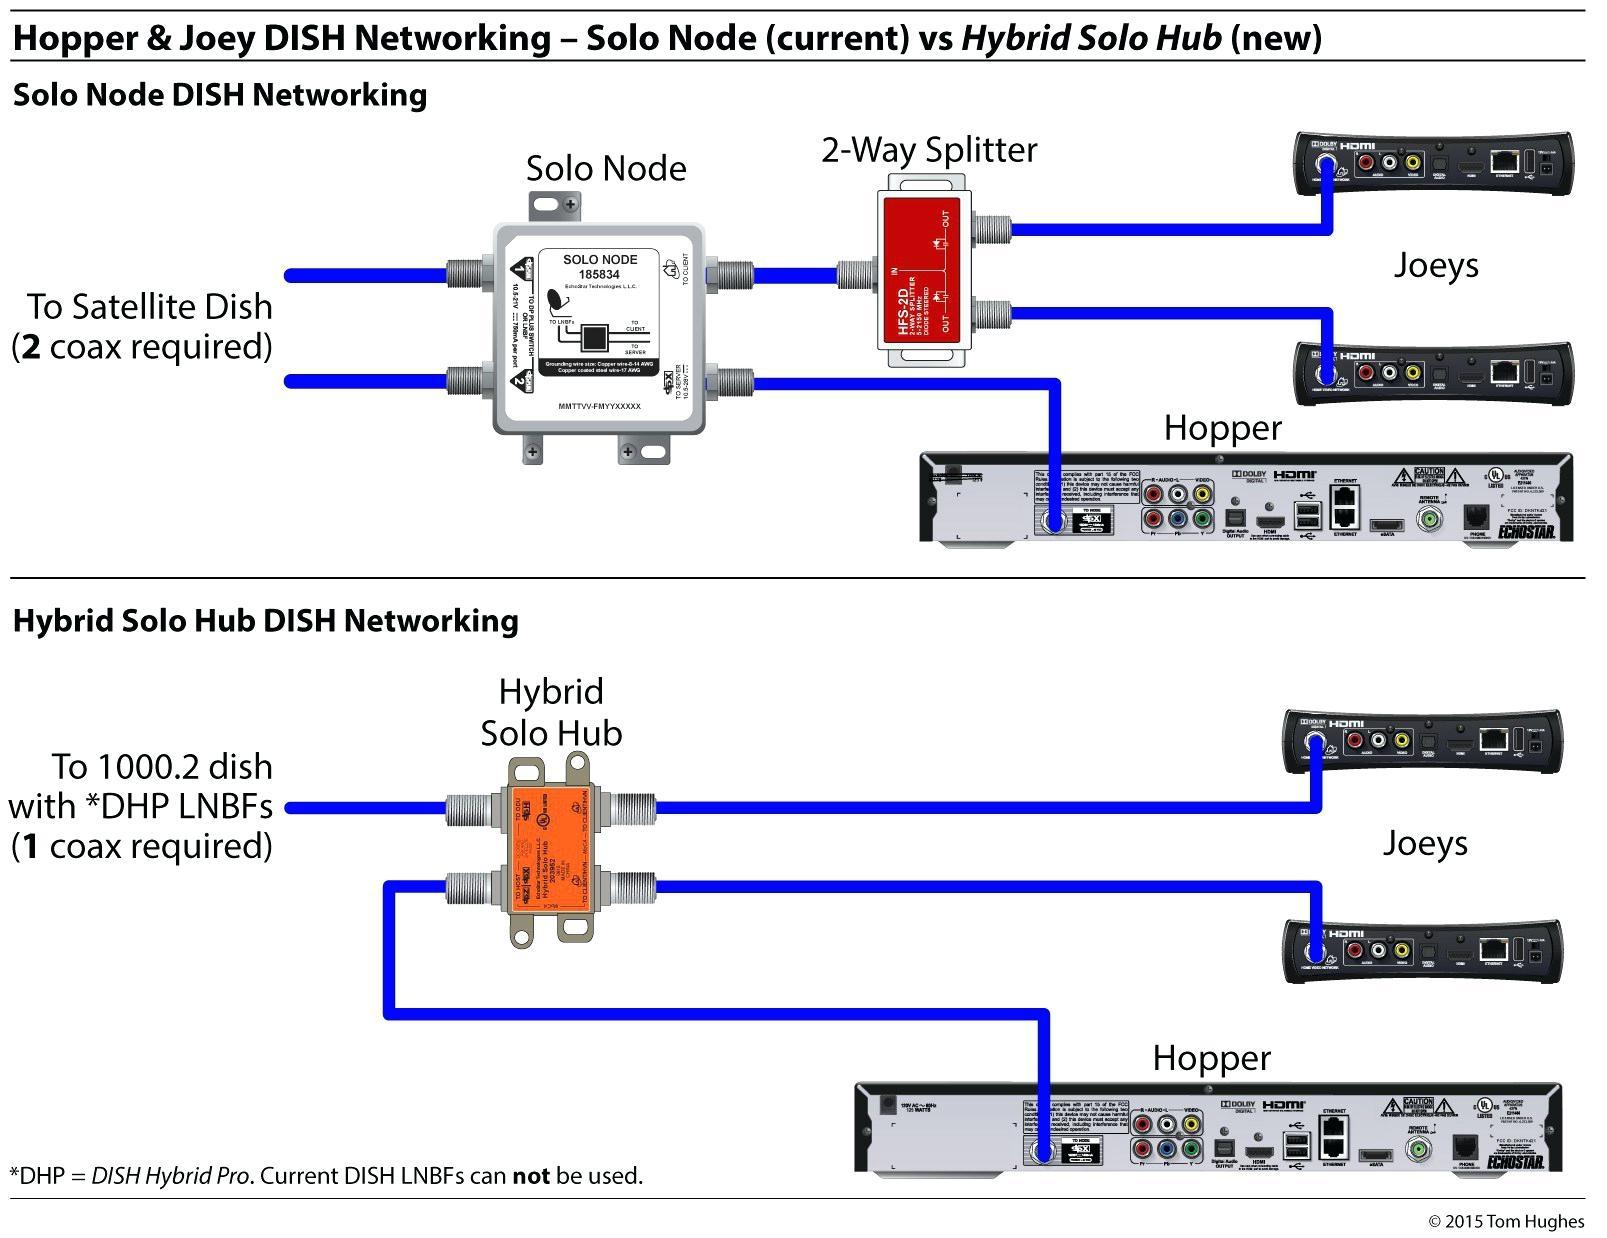 dish hopper joey wiring diagram Collection-Best Dish Network Wiring Diagram Irelandnews 8-o